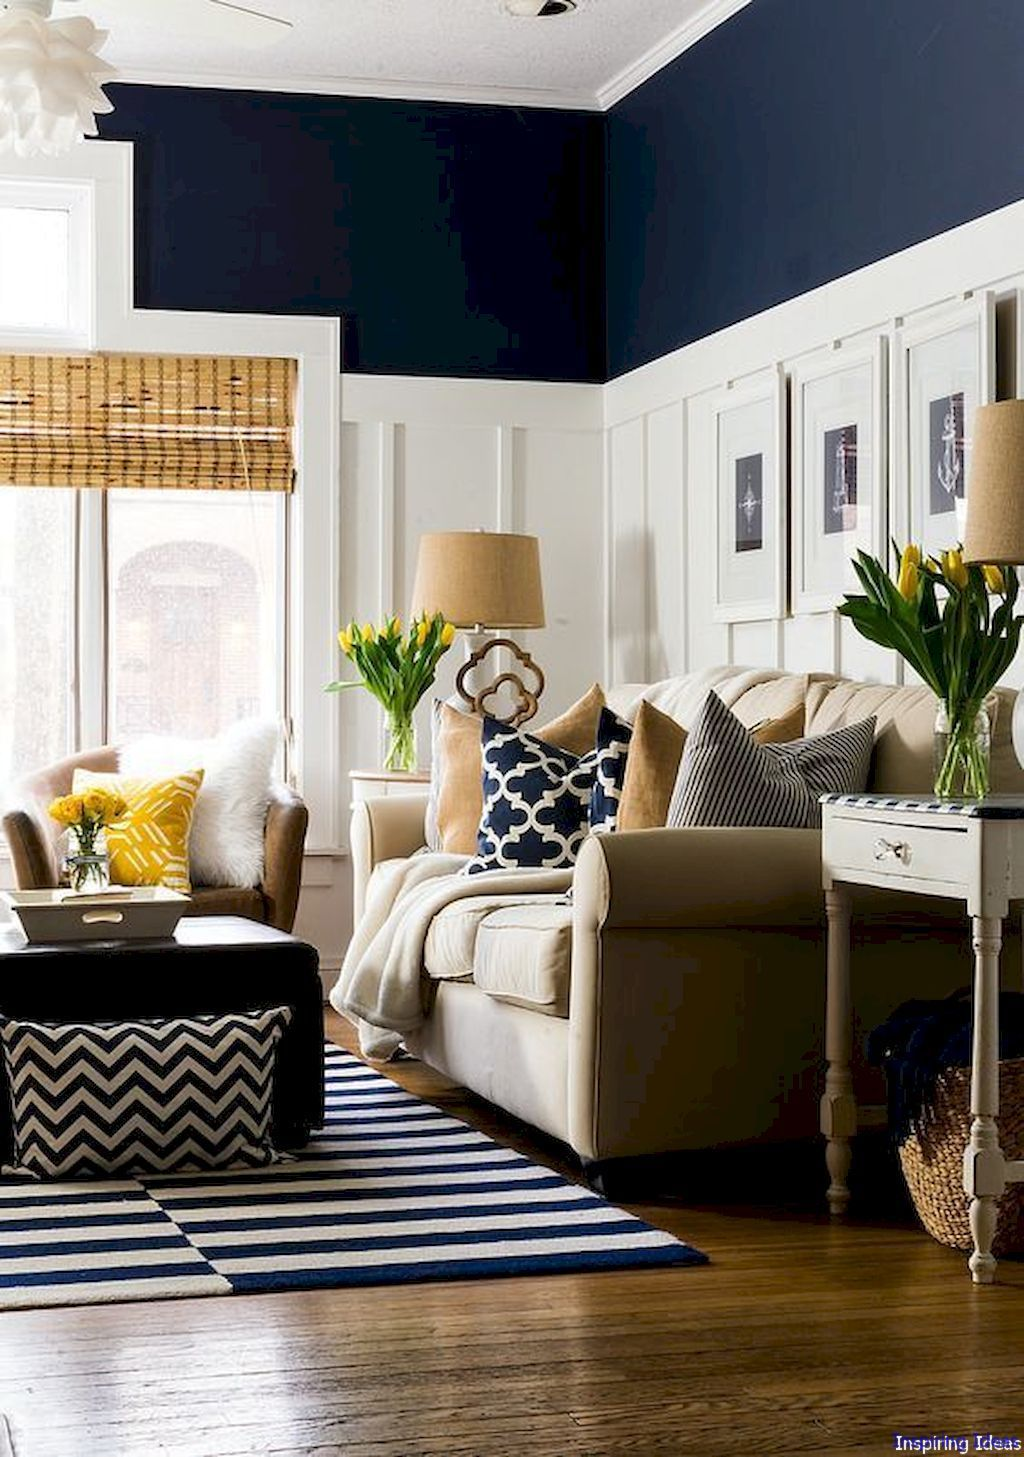 Interior home decorating ideas living room  best inspiration of living room decor ideas  room decor room